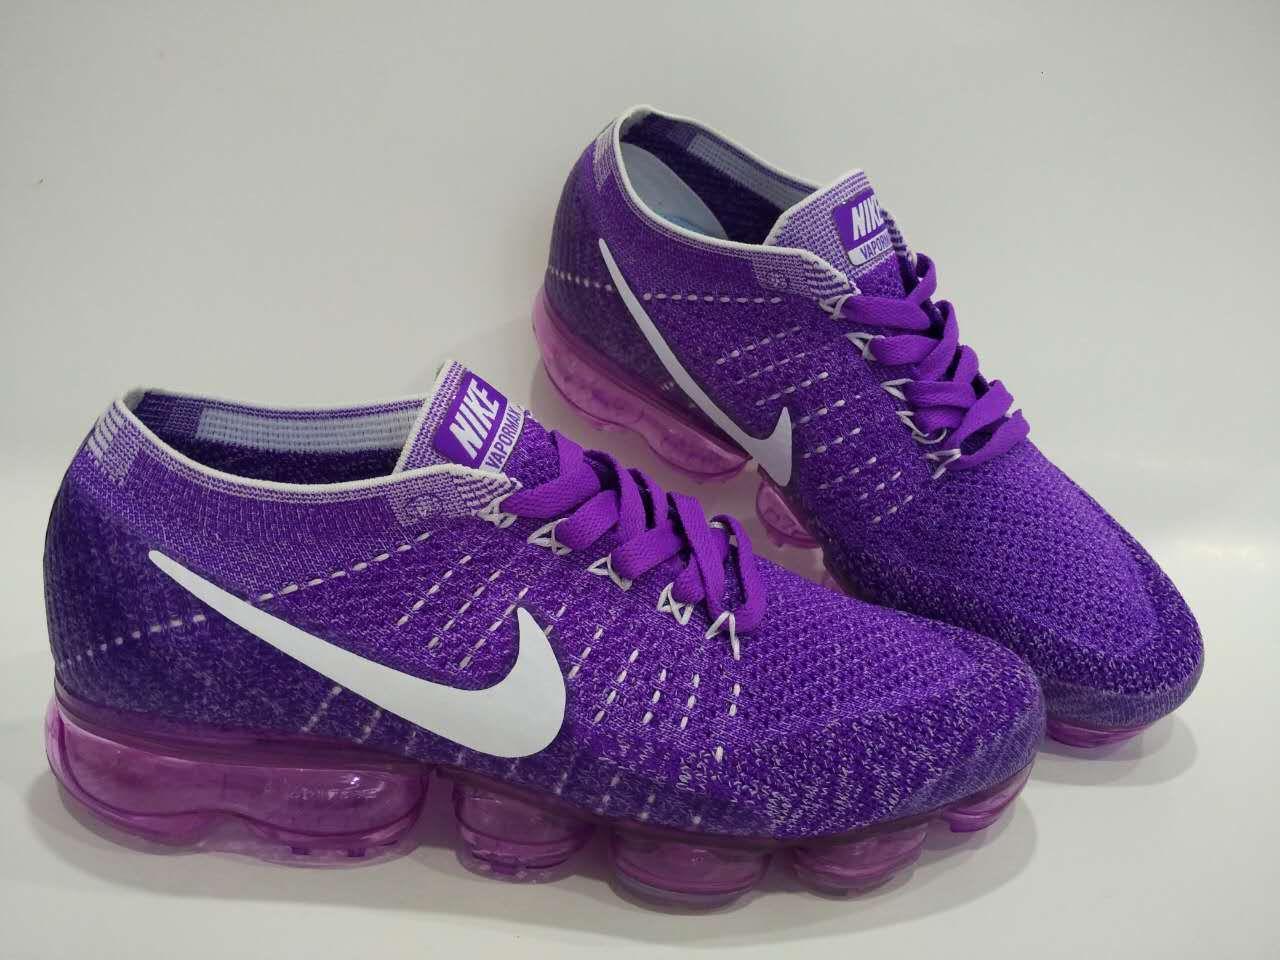 0a43ca764856 Women Nike Air Vapormax Flyknit Purple White